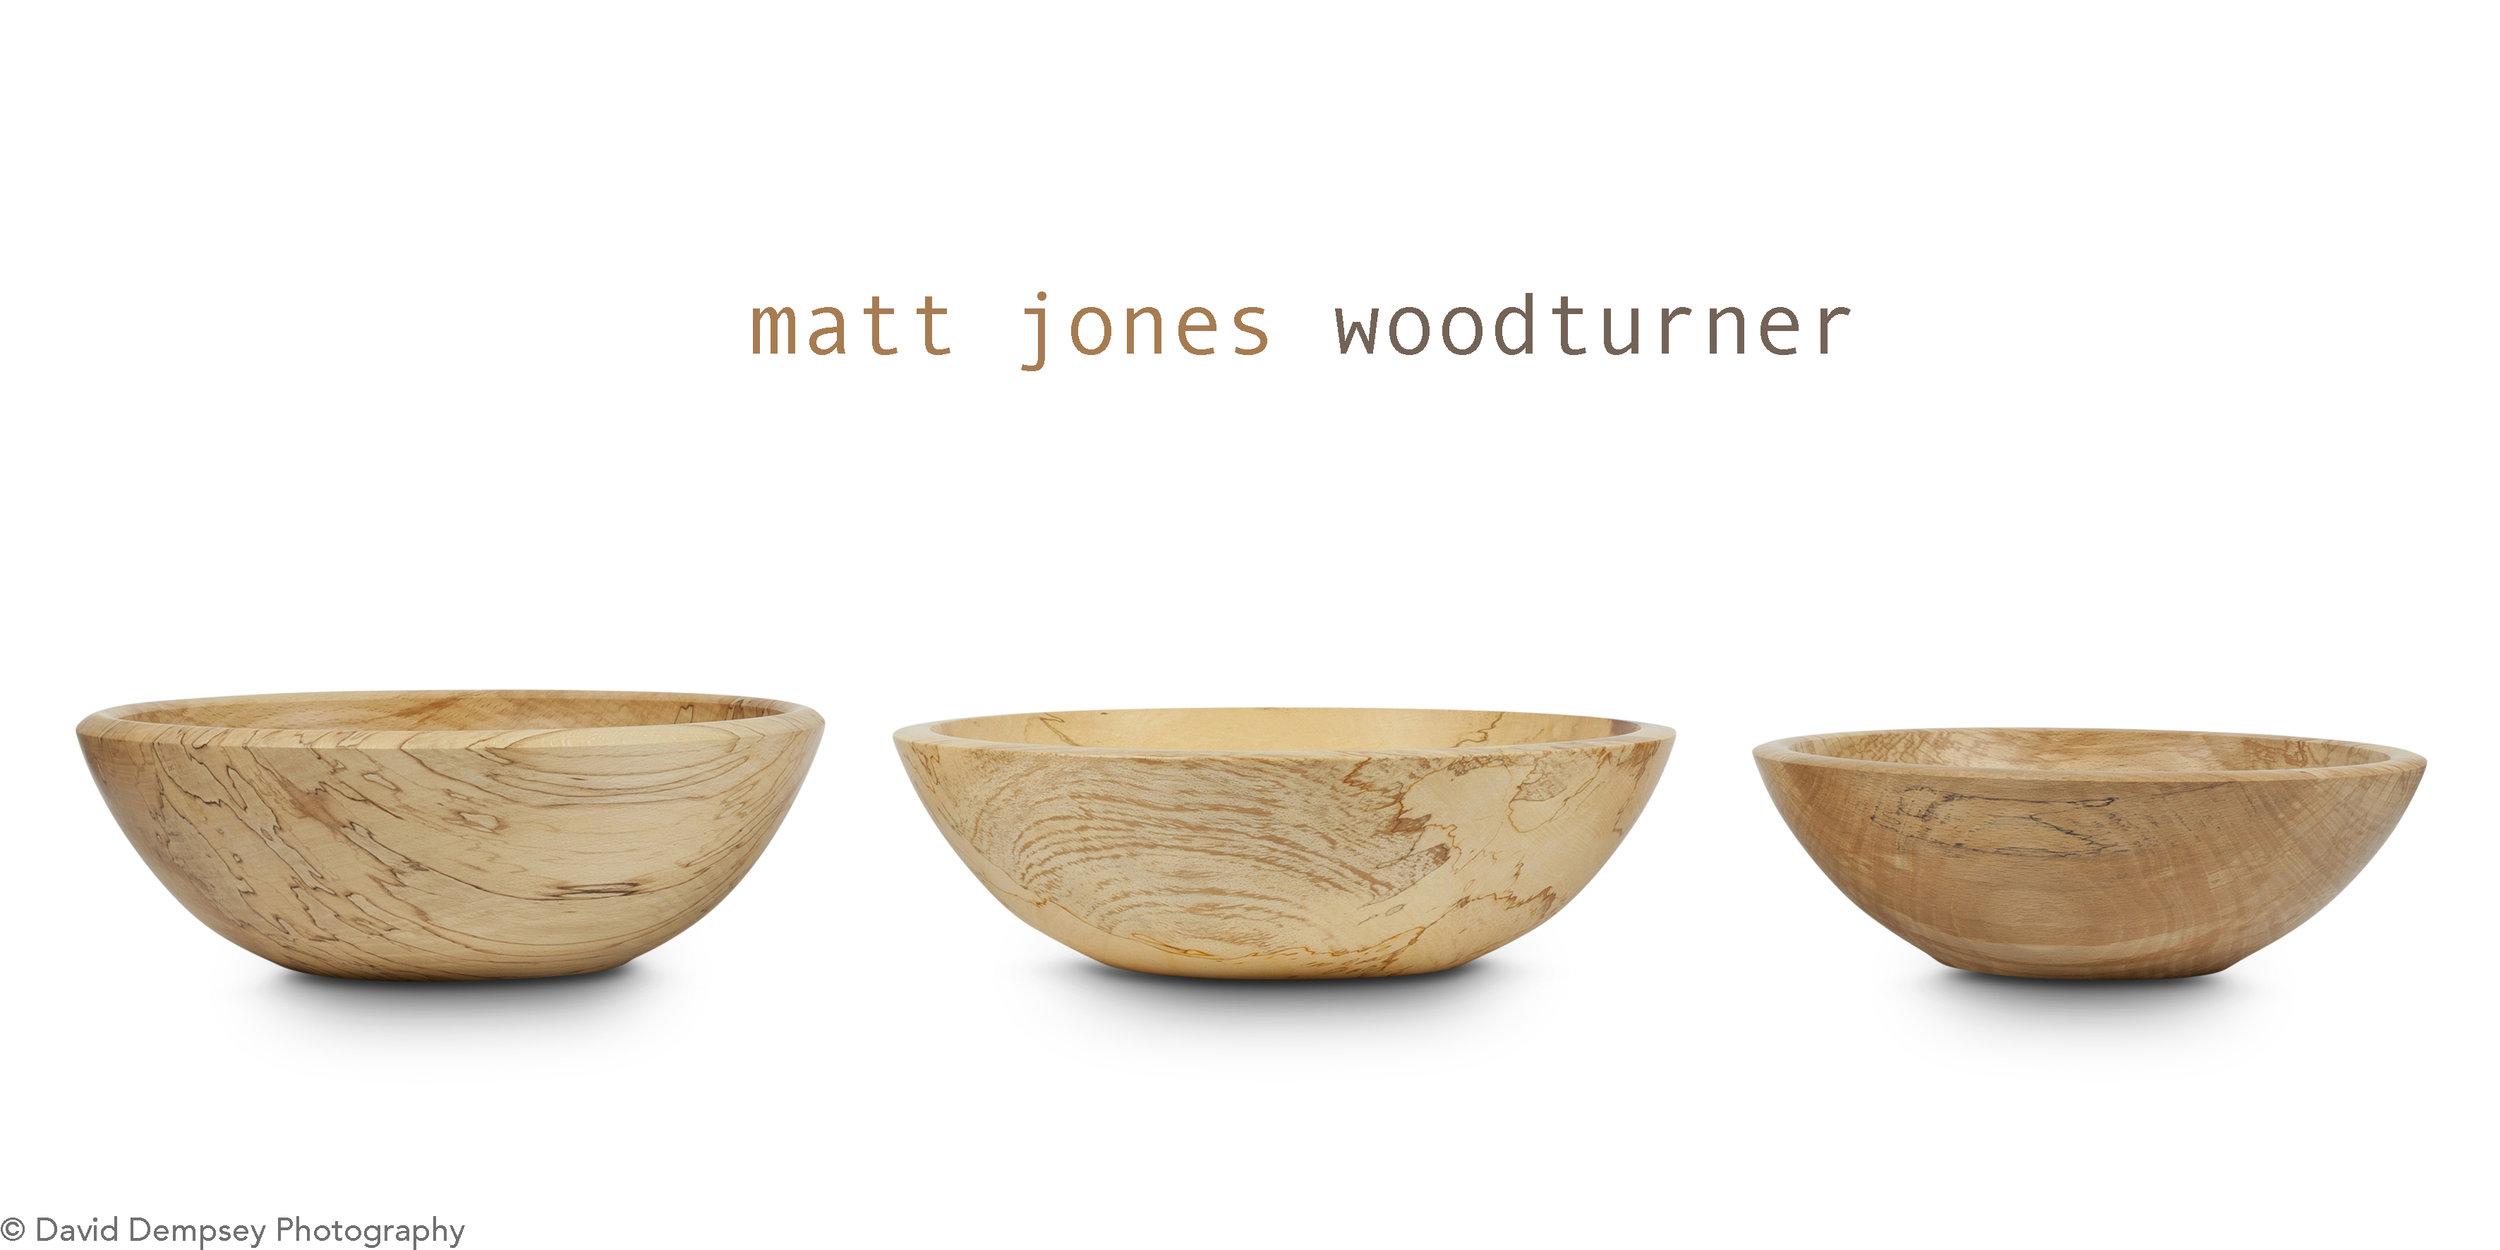 By Matt Jones Woodturner